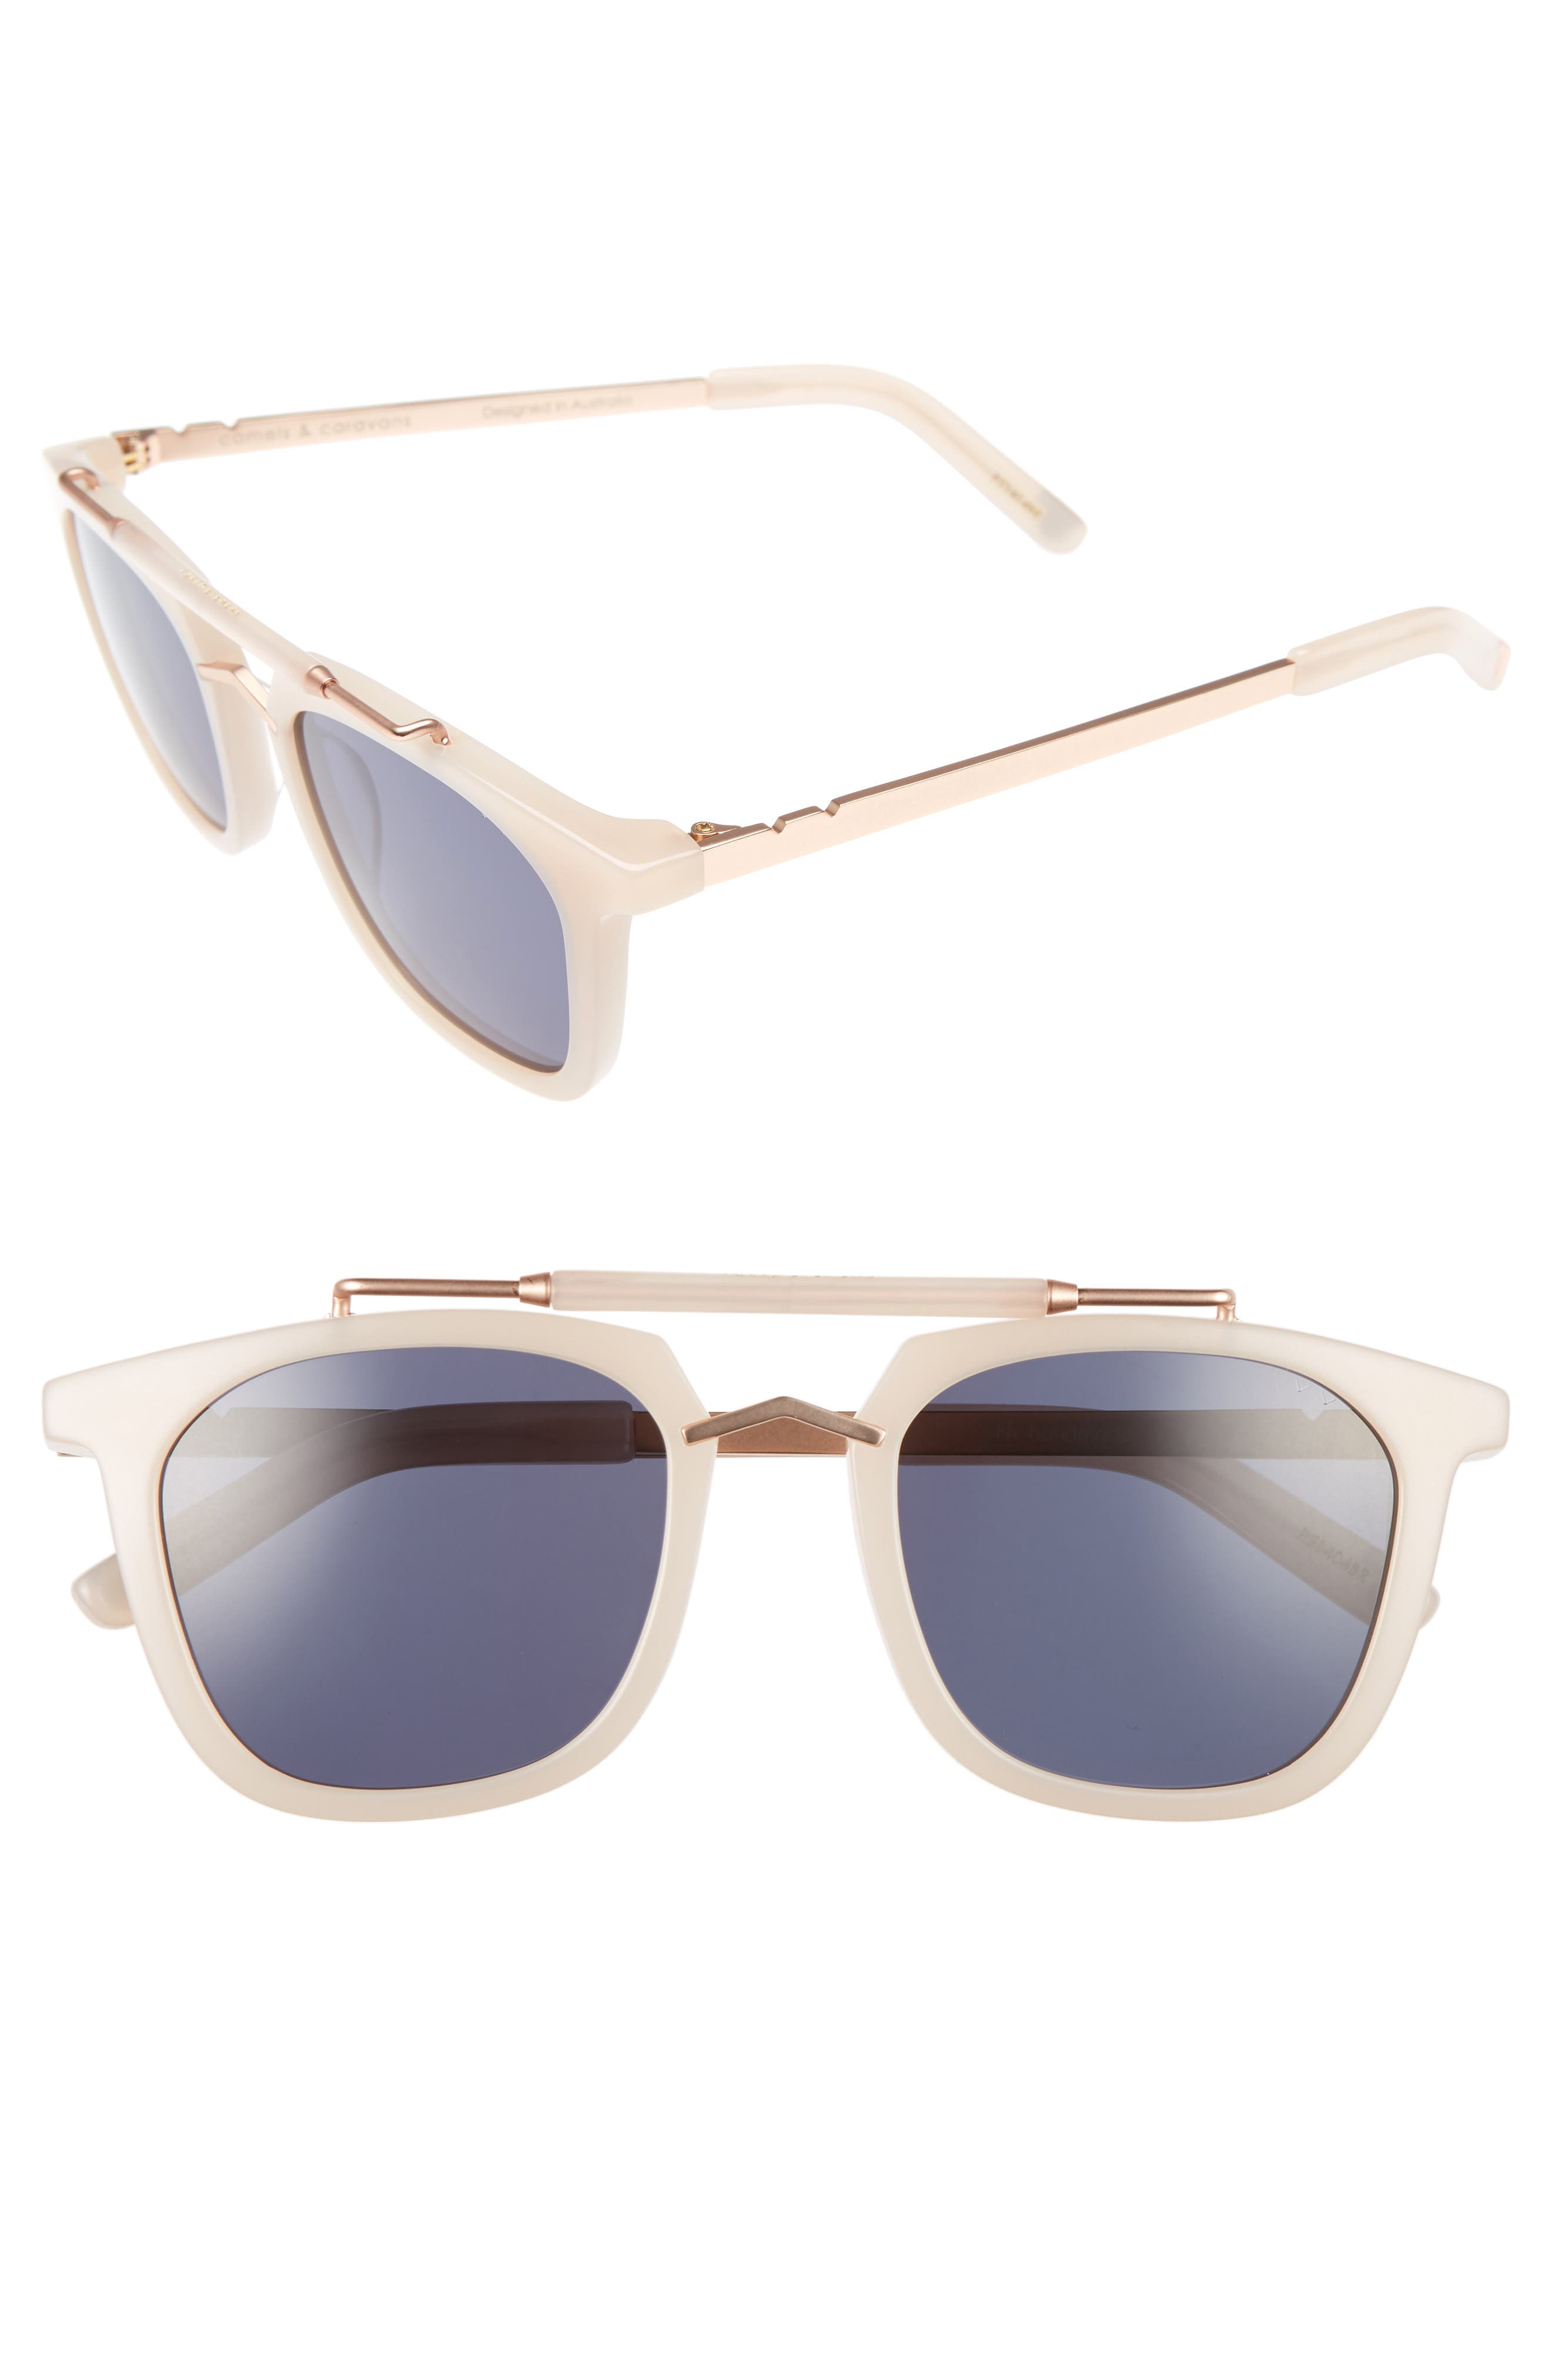 Camels & Caravans 50mm Retro Sunglasses,                         Main,                         color, Blush/ Rose Gold Grey